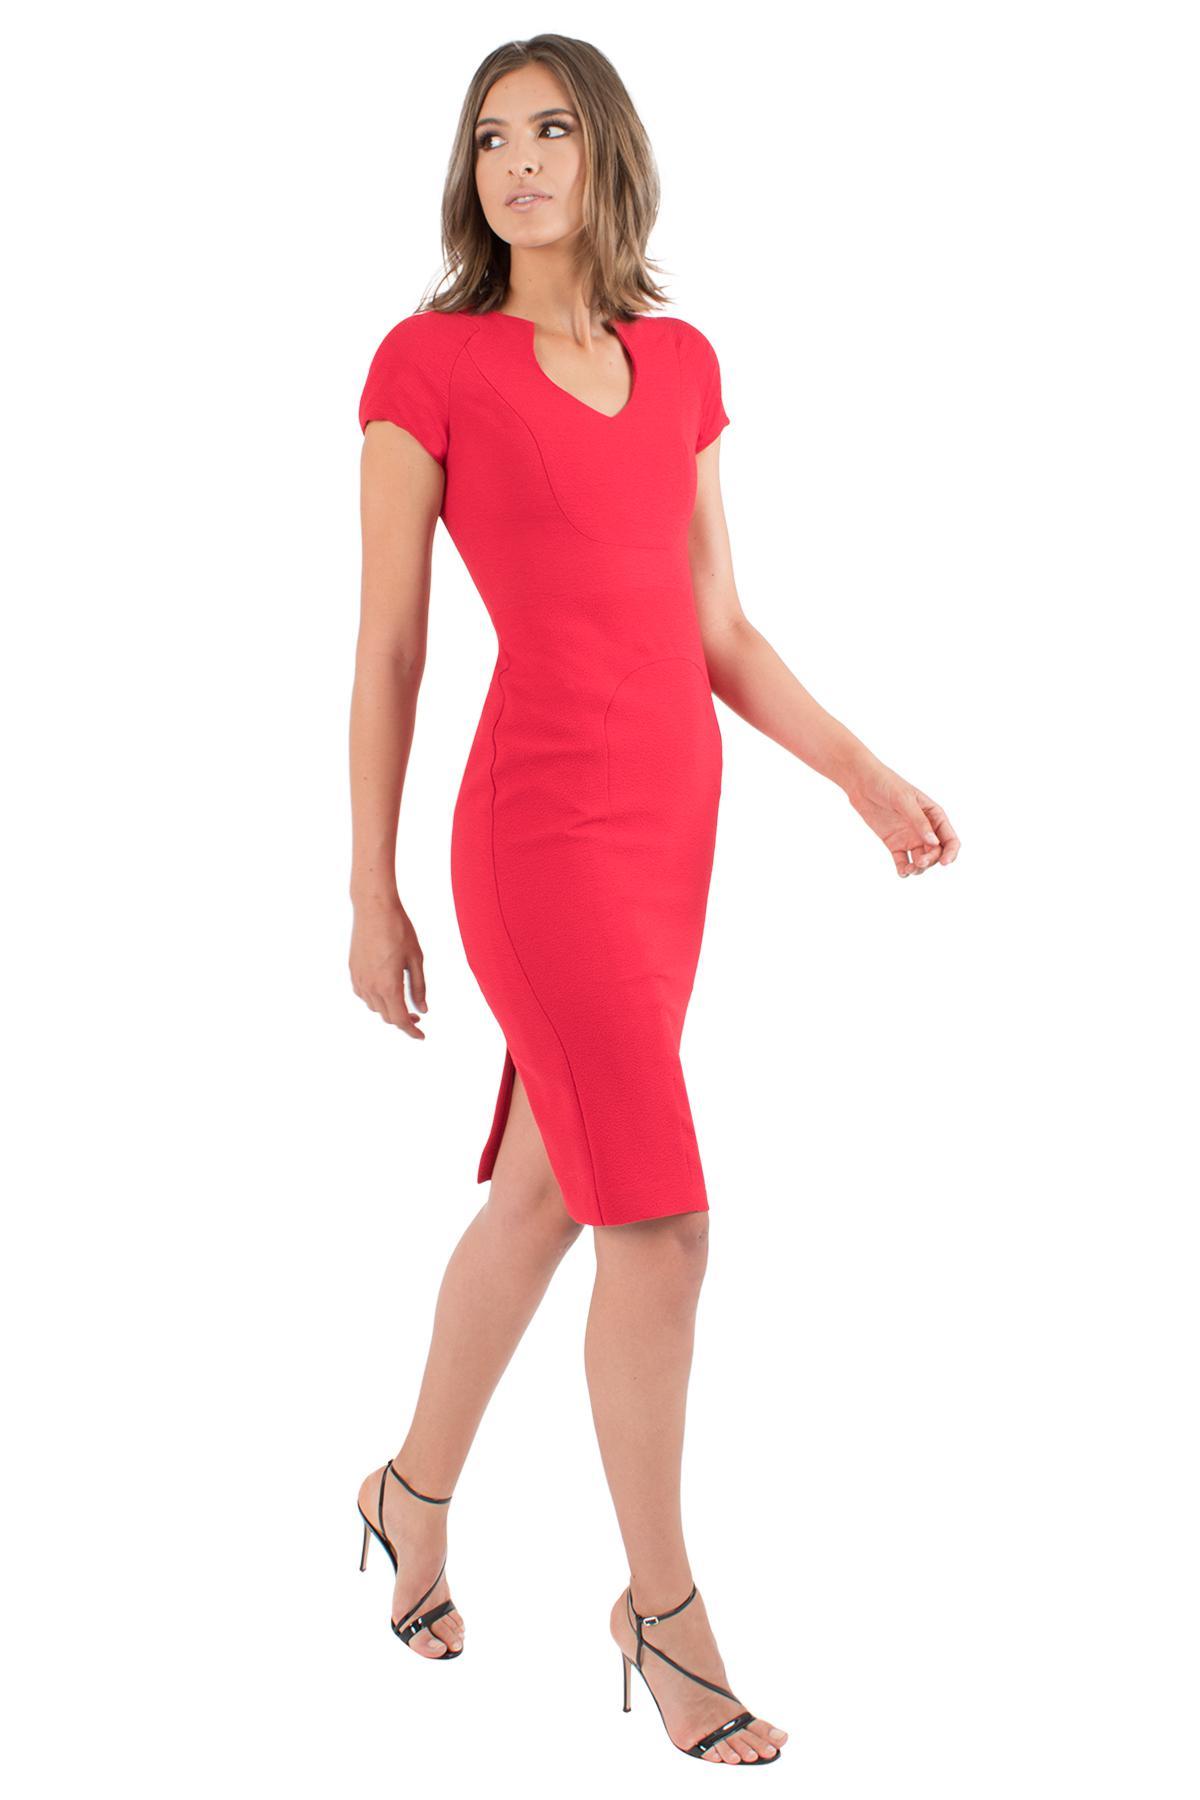 35d79c07aa5 Lyst - Black Halo Gypsy Rose Sheath in Red